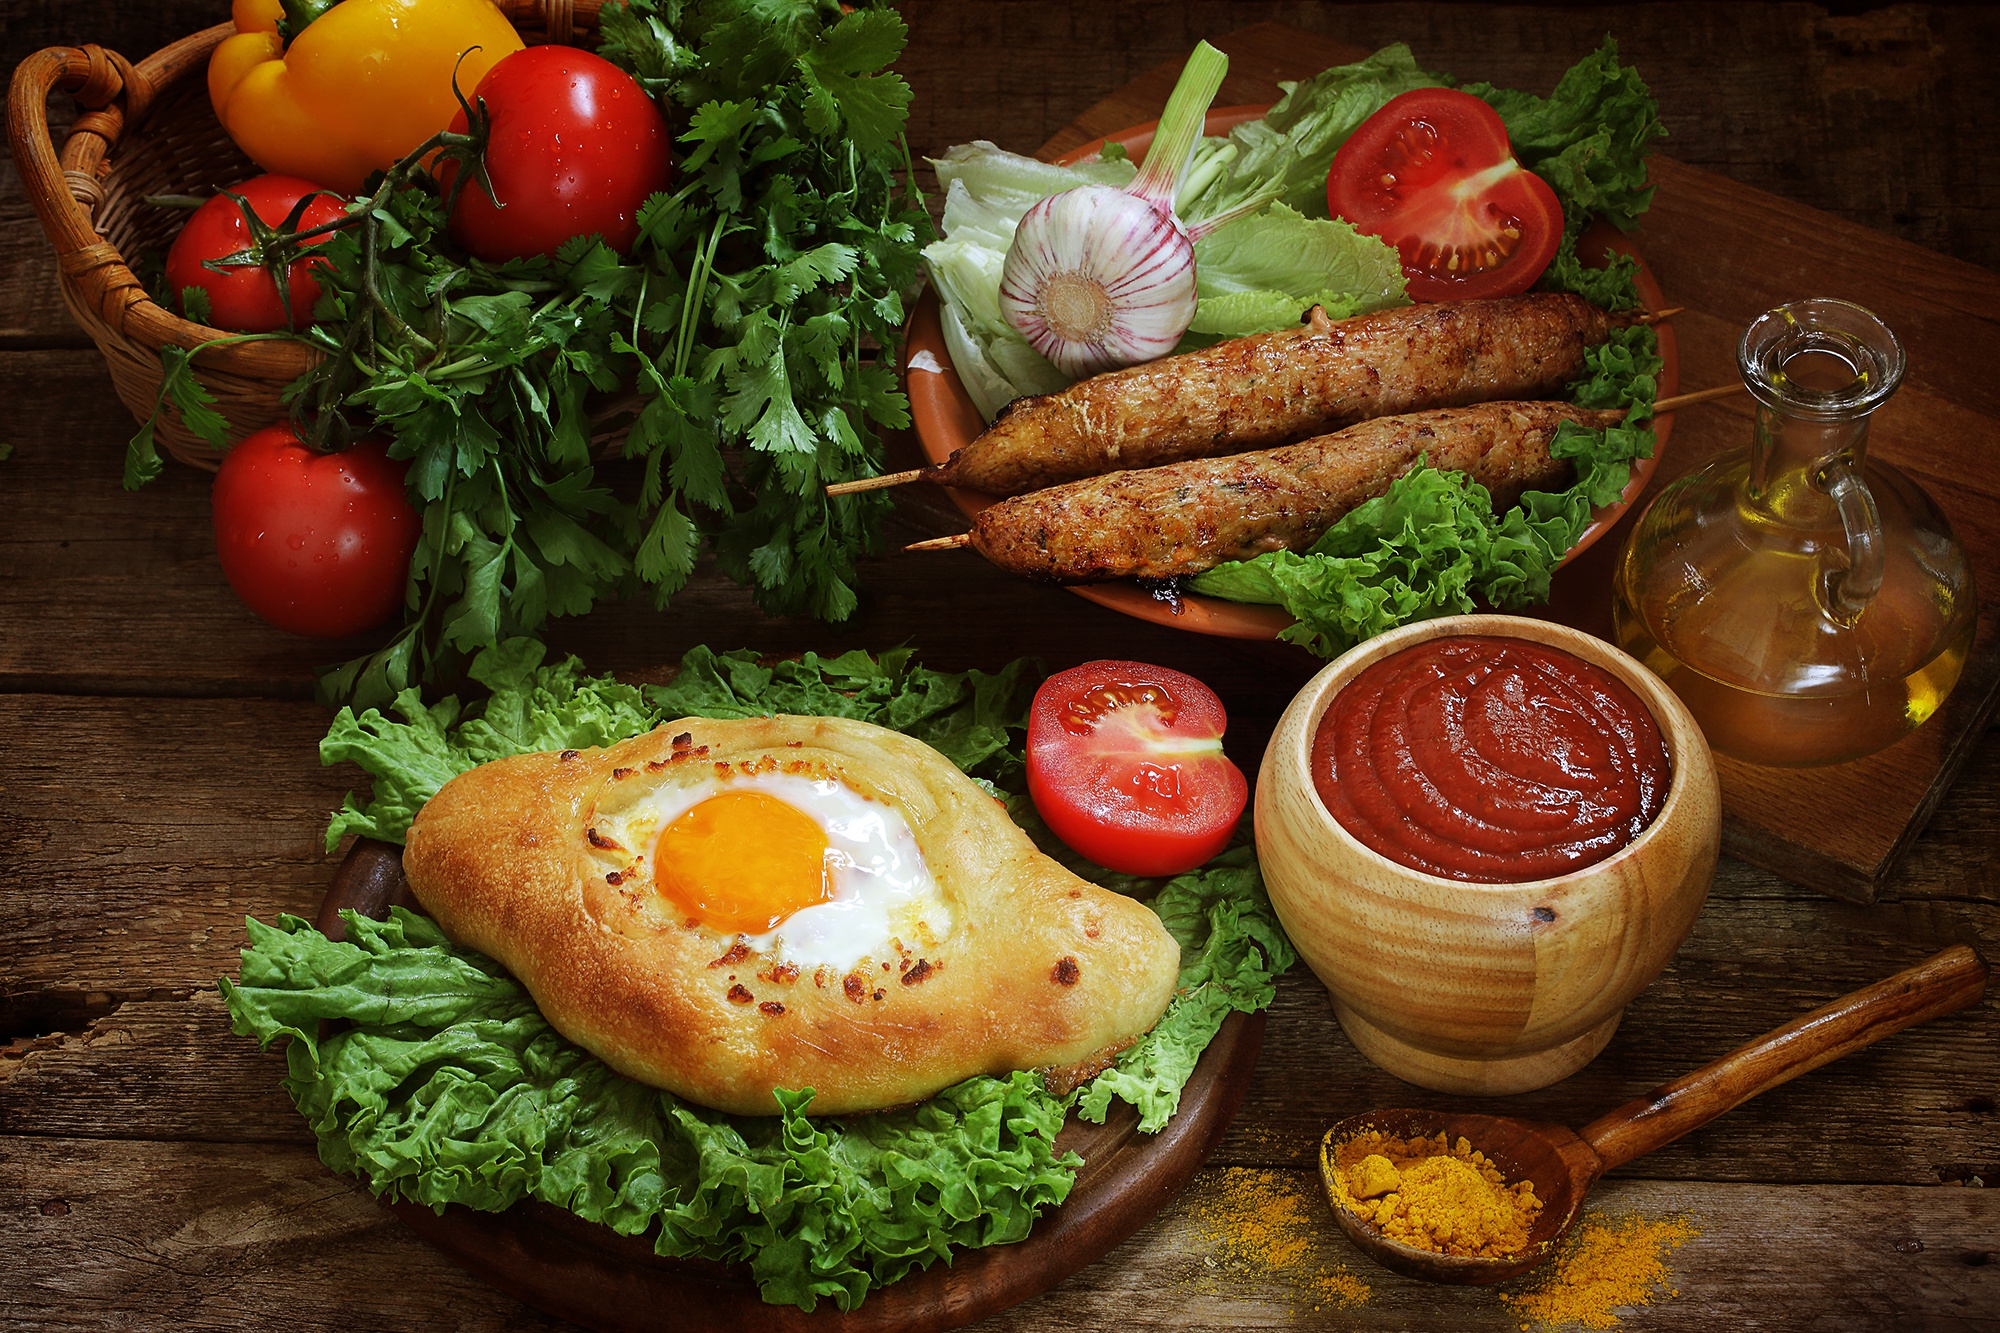 Egg Ketchup Still Life Tomato 2000x1333